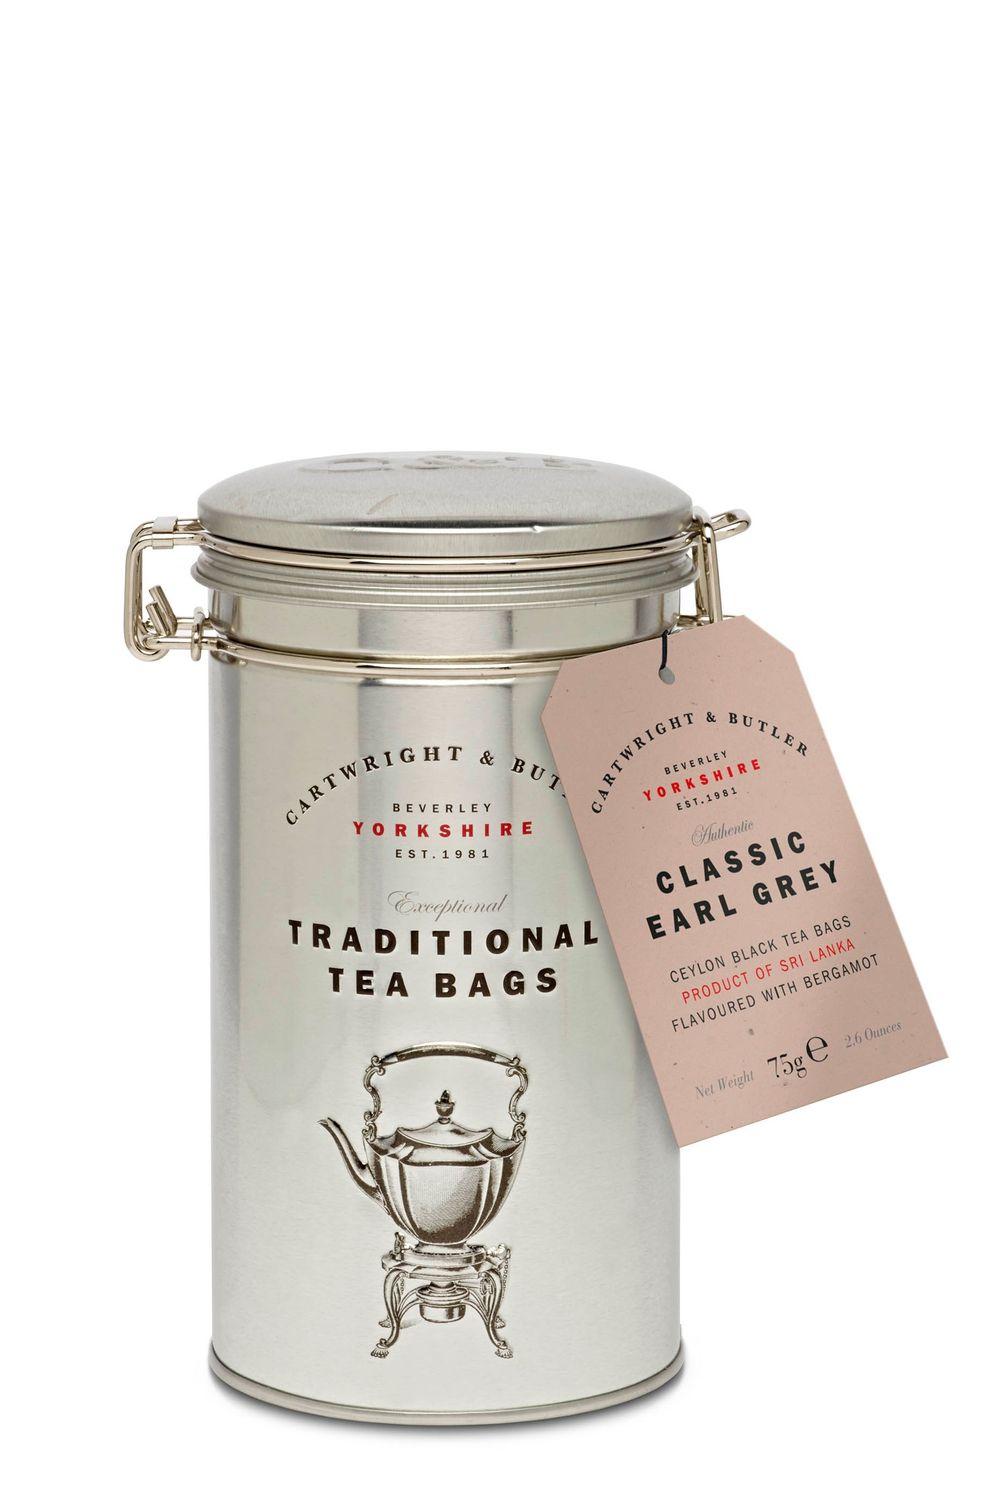 Earl Grey Tea Bags in Caddy